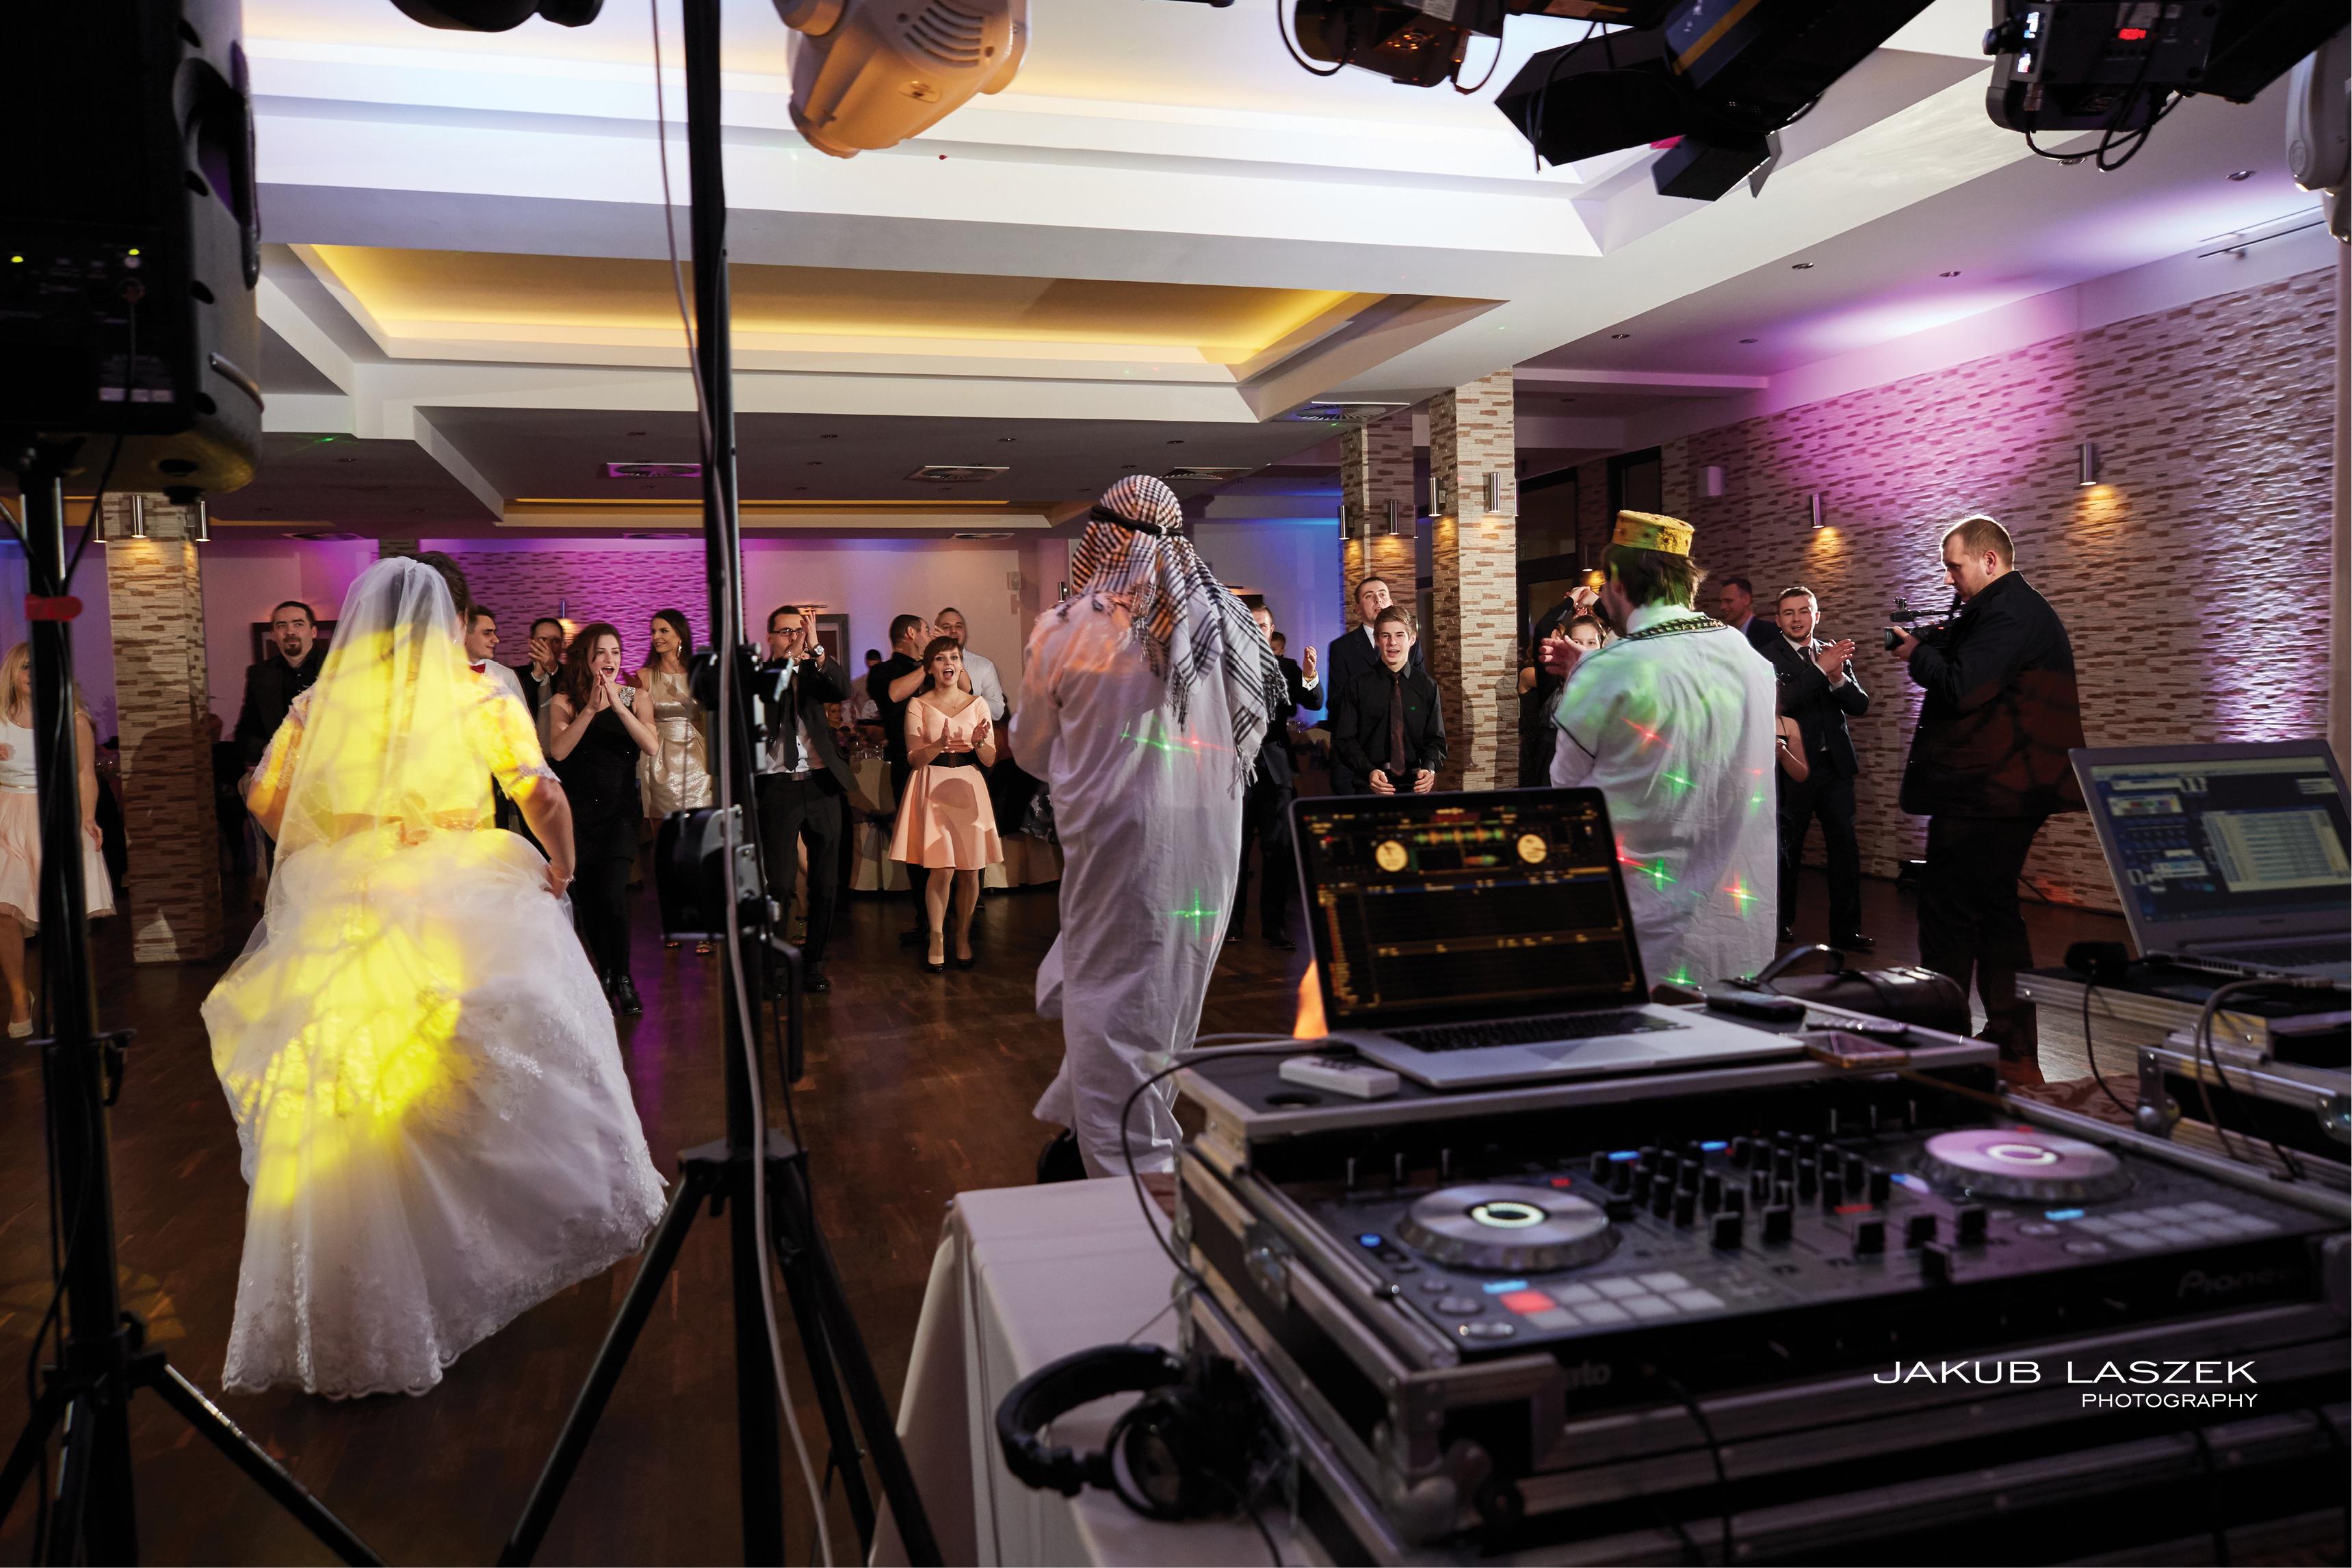 tarnow_fotograf_slubny_wedding_photographer34